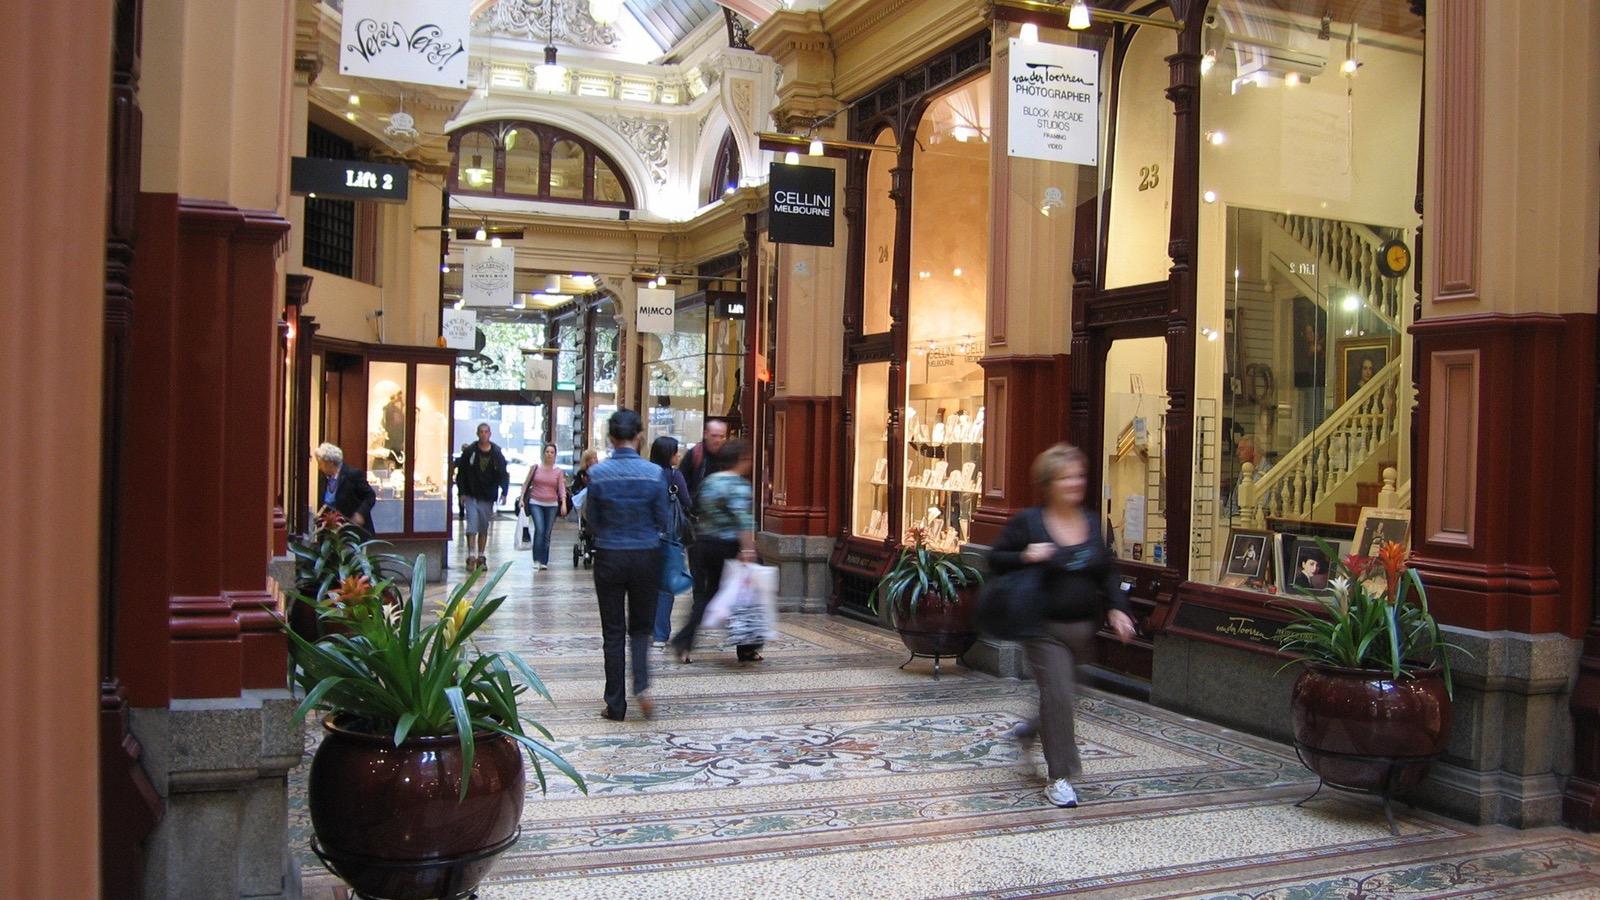 The Block Arcade-Collins St